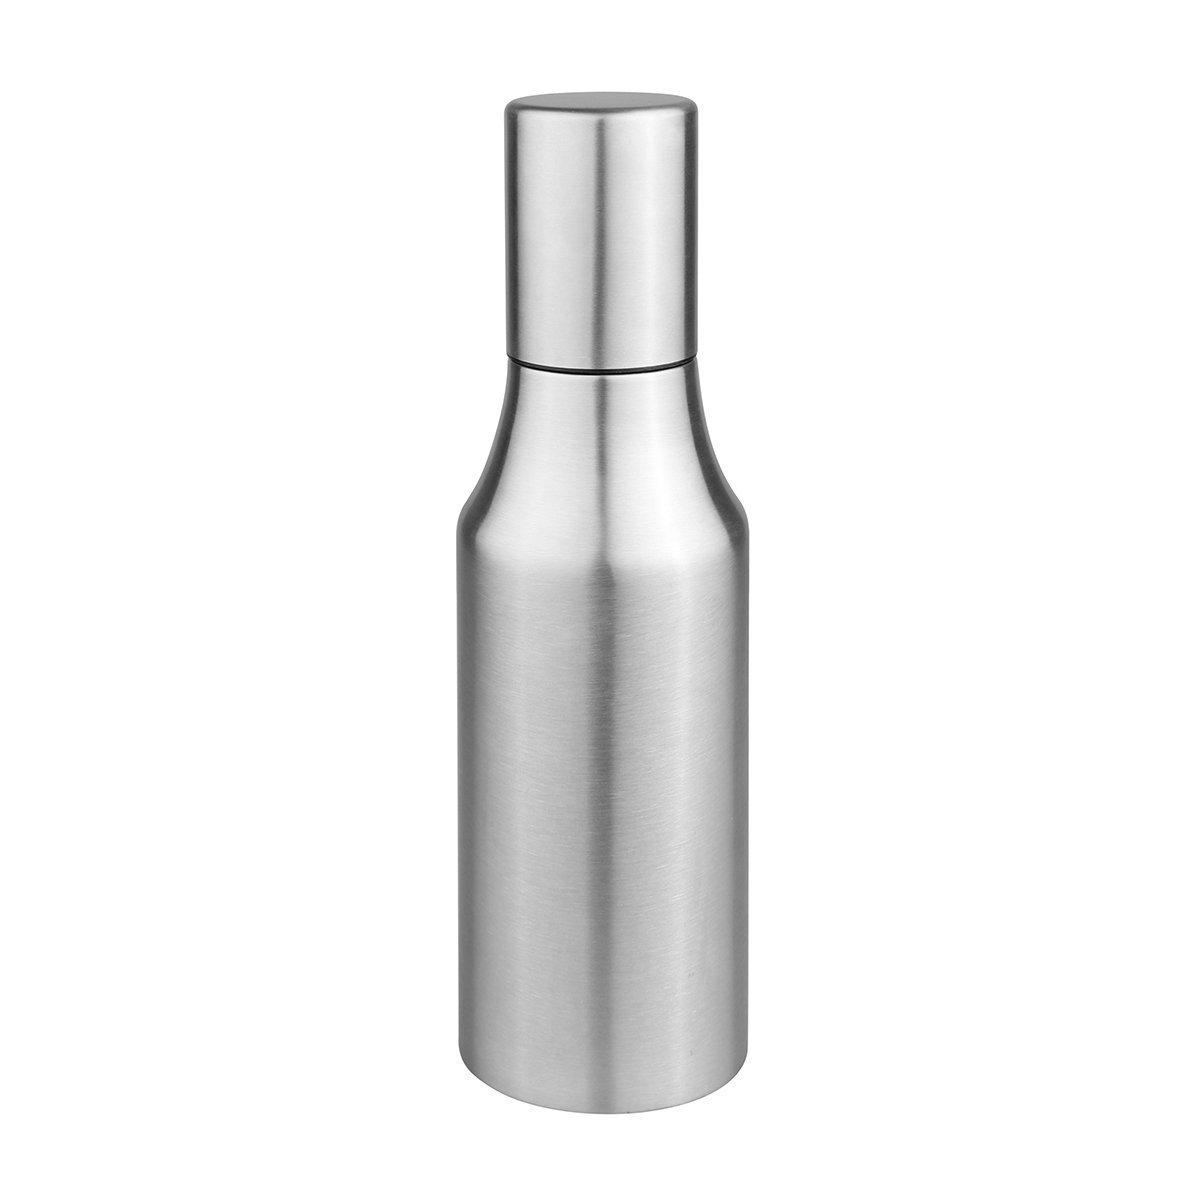 Amazon.com: 3pcs Leakproof Cooking Olive Oil Dispenser Soy Sauce ...